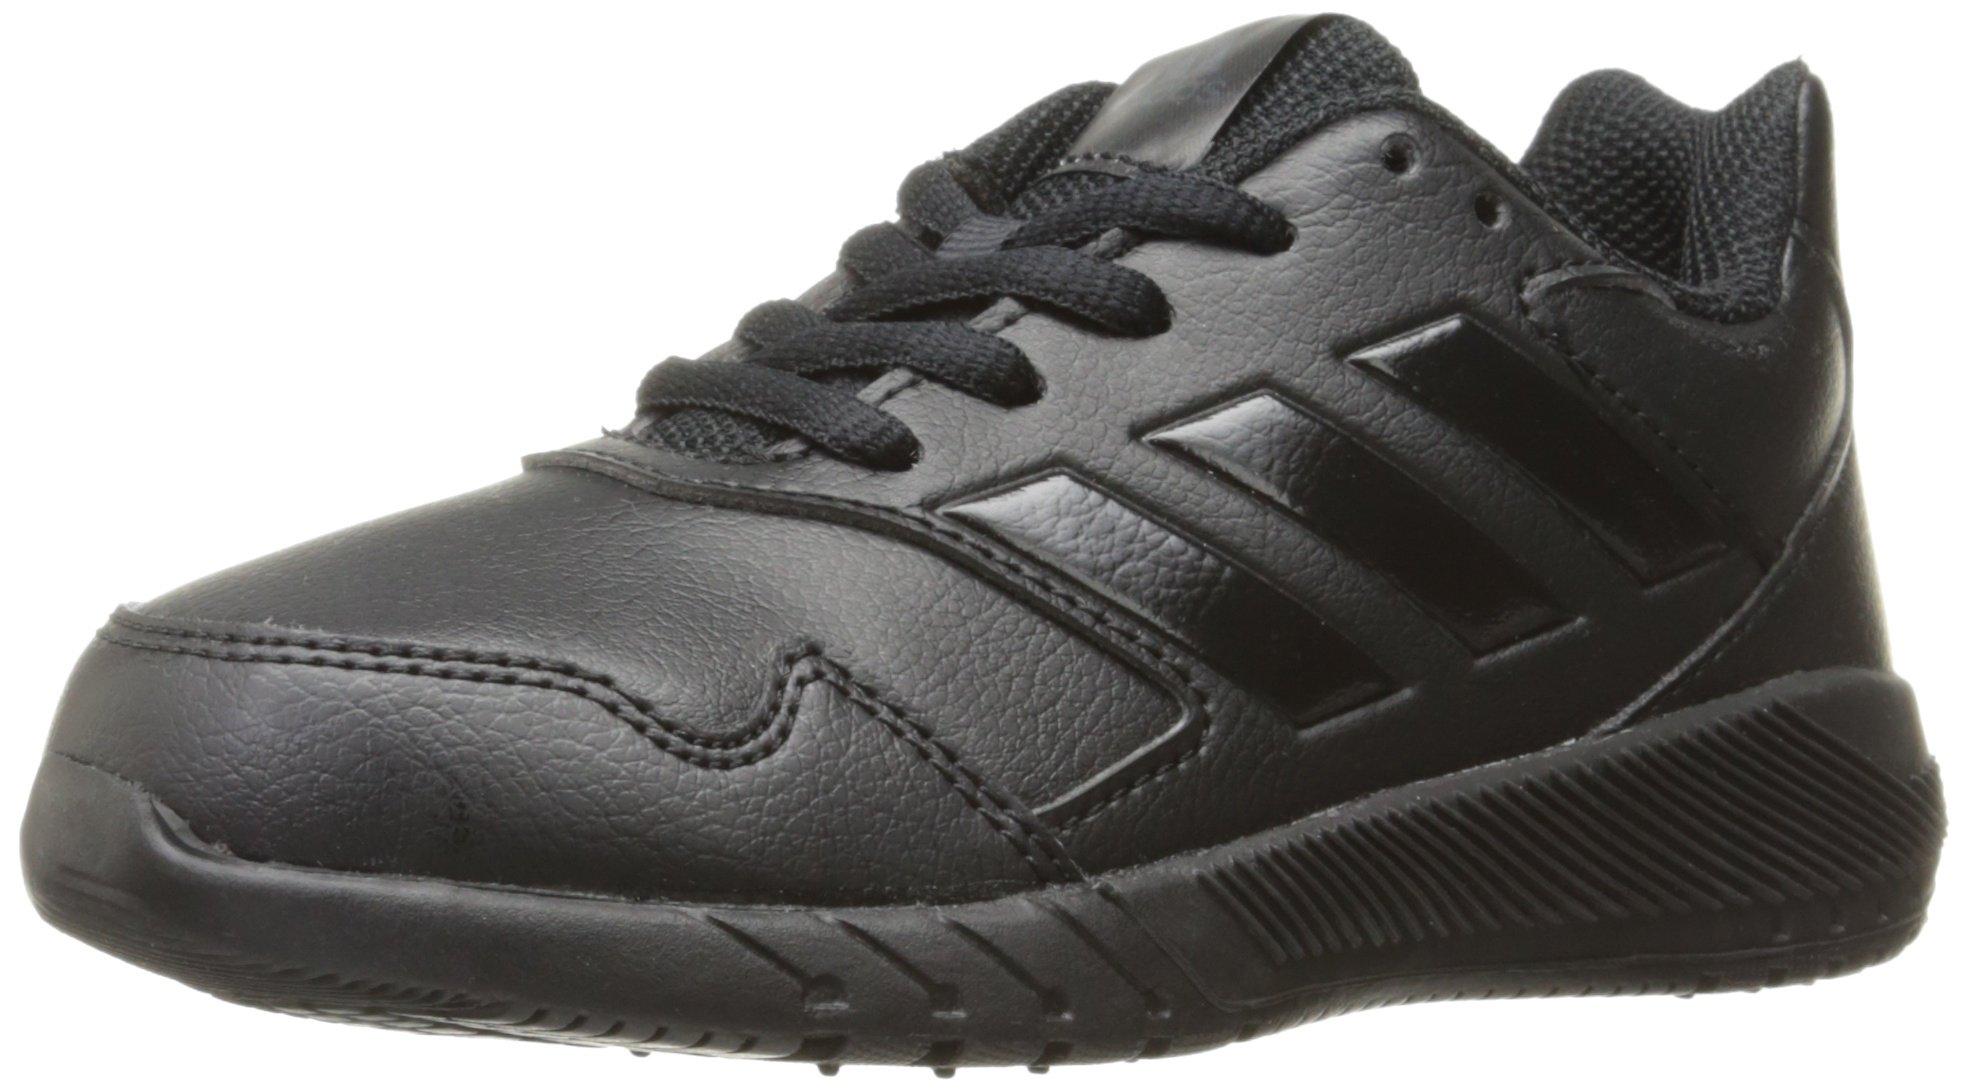 adidas Kids' Altarun Running Shoe, Black/Black/Dark Solid Grey, 4.5 Medium US Little Kid